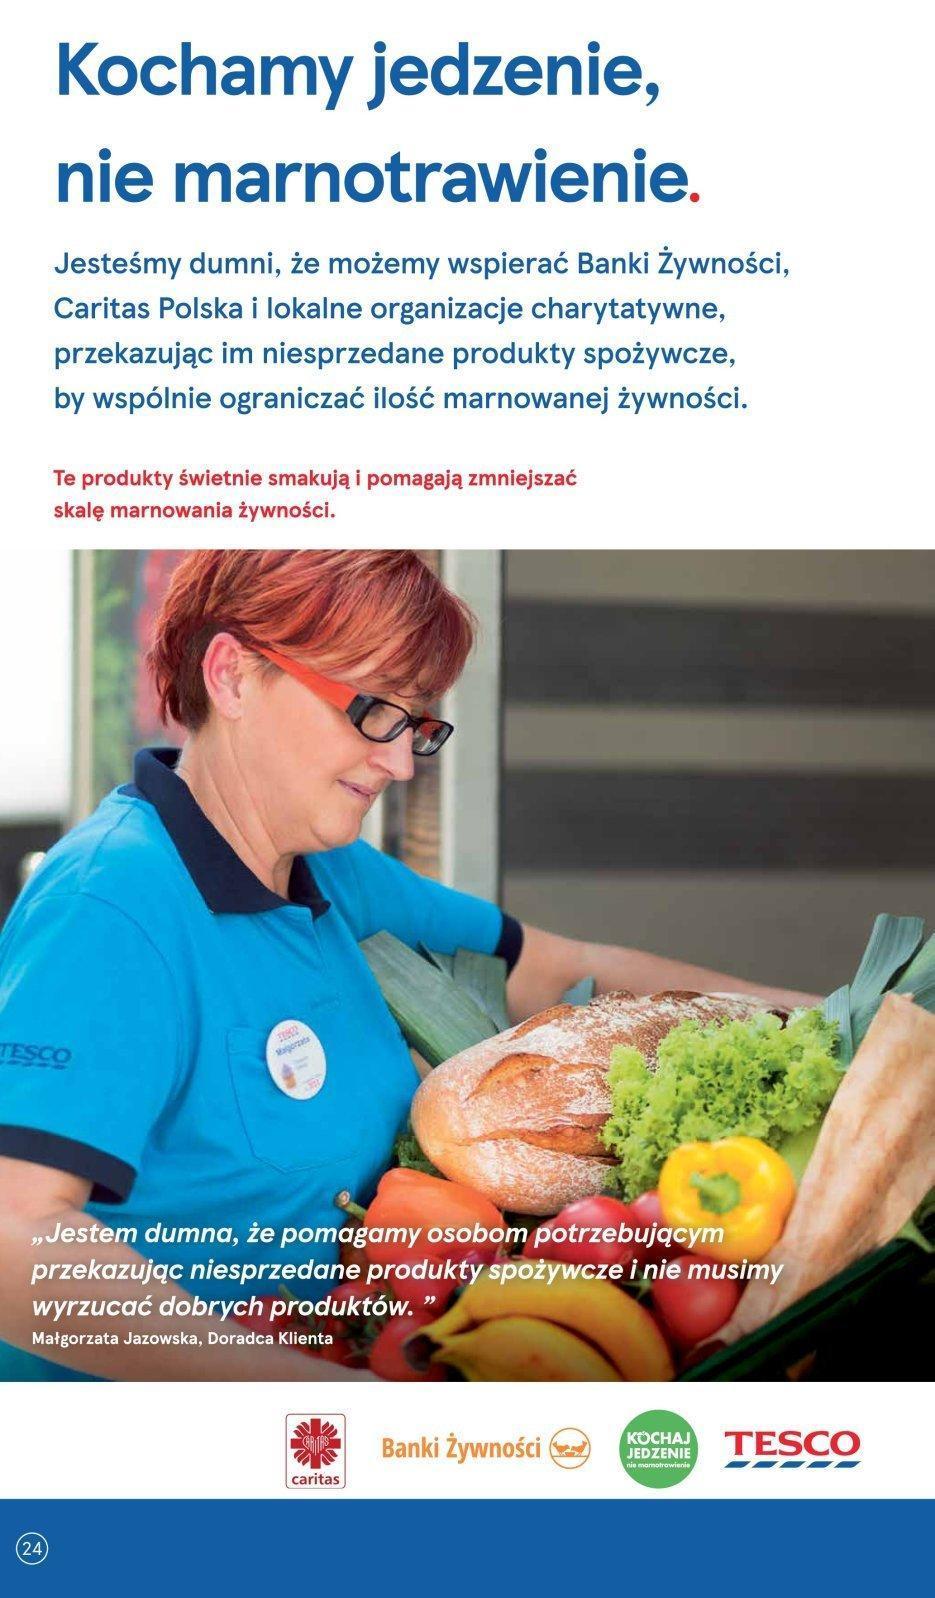 Gazetka promocyjna Tesco do 05/06/2019 str.23